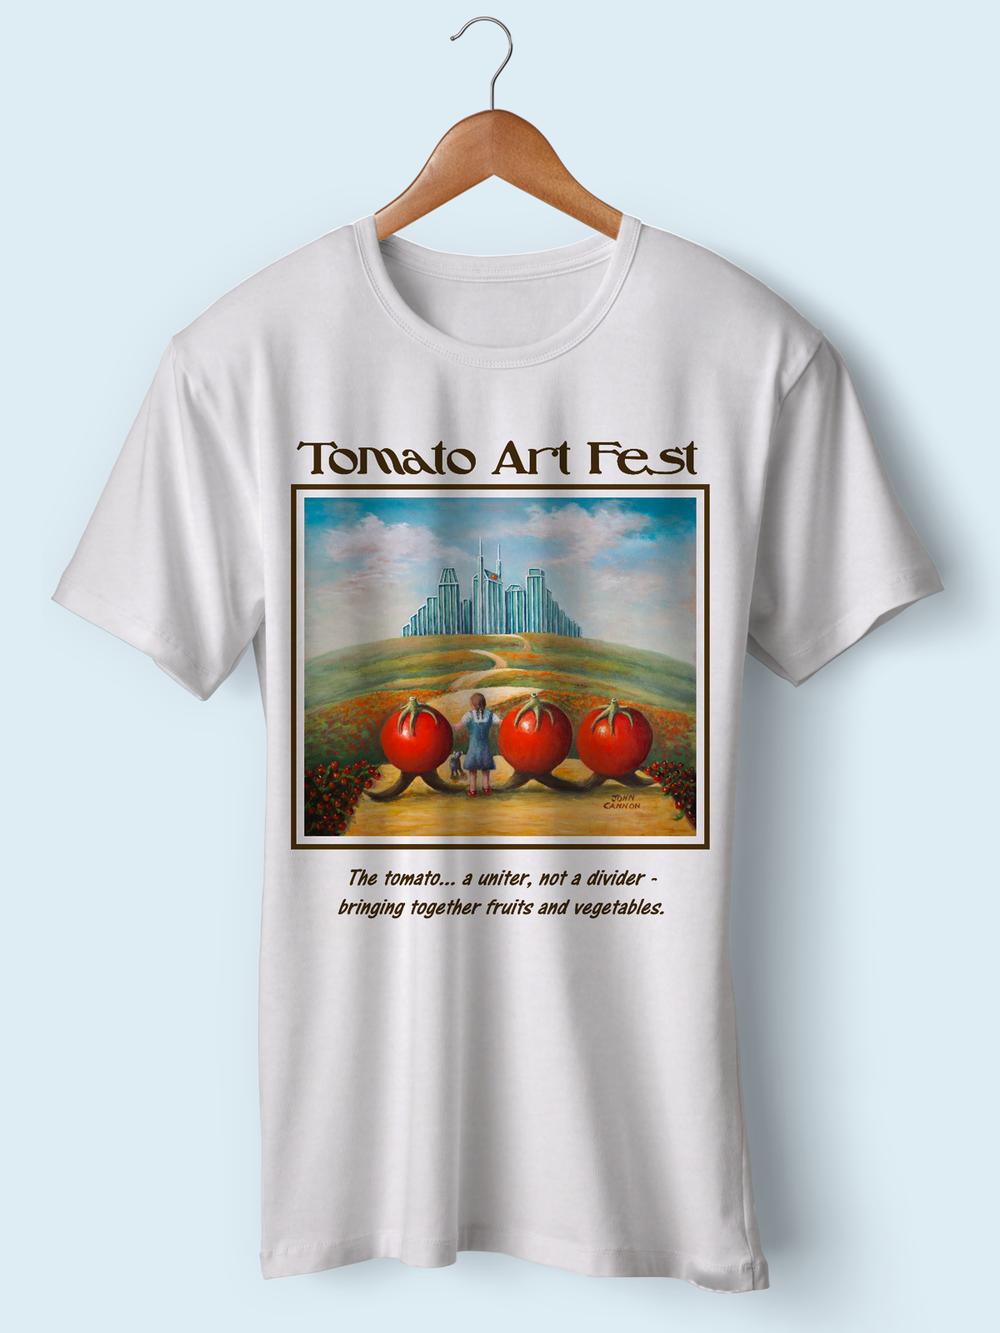 2016 Tomato Art Fest Shirt